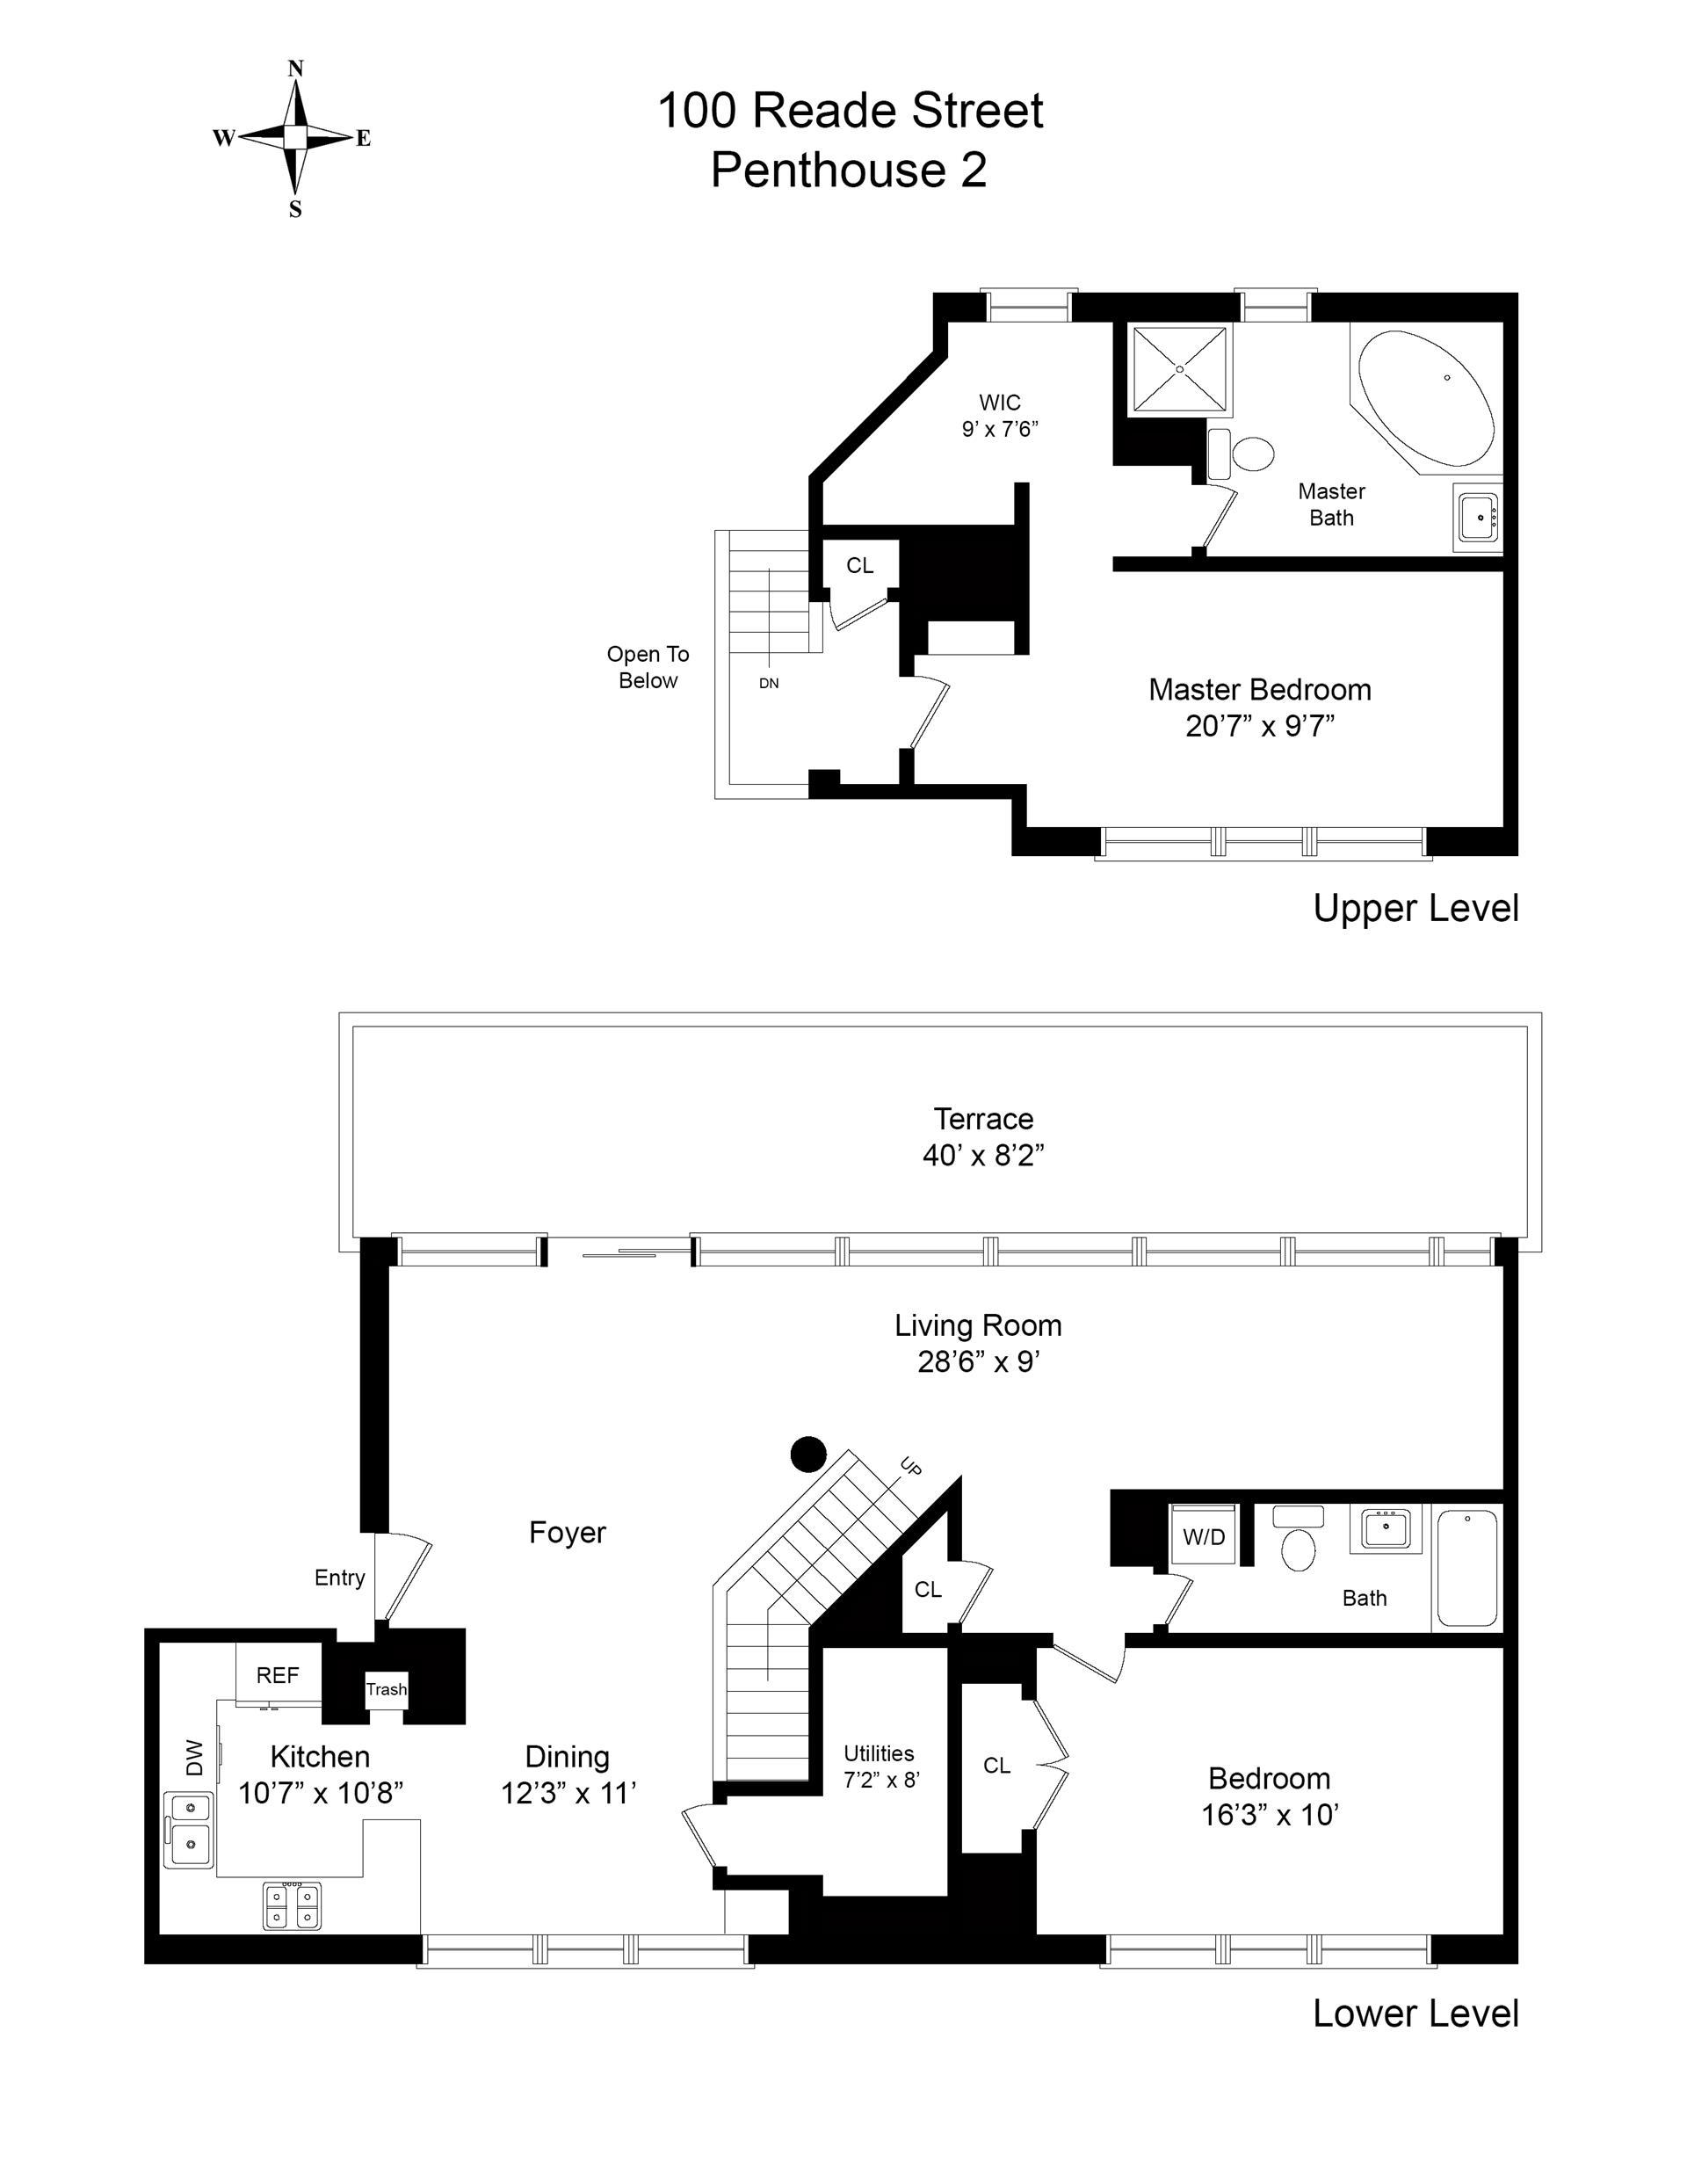 Floor plan of Tribeca Court, 100 Reade St, PH2 - TriBeCa, New York